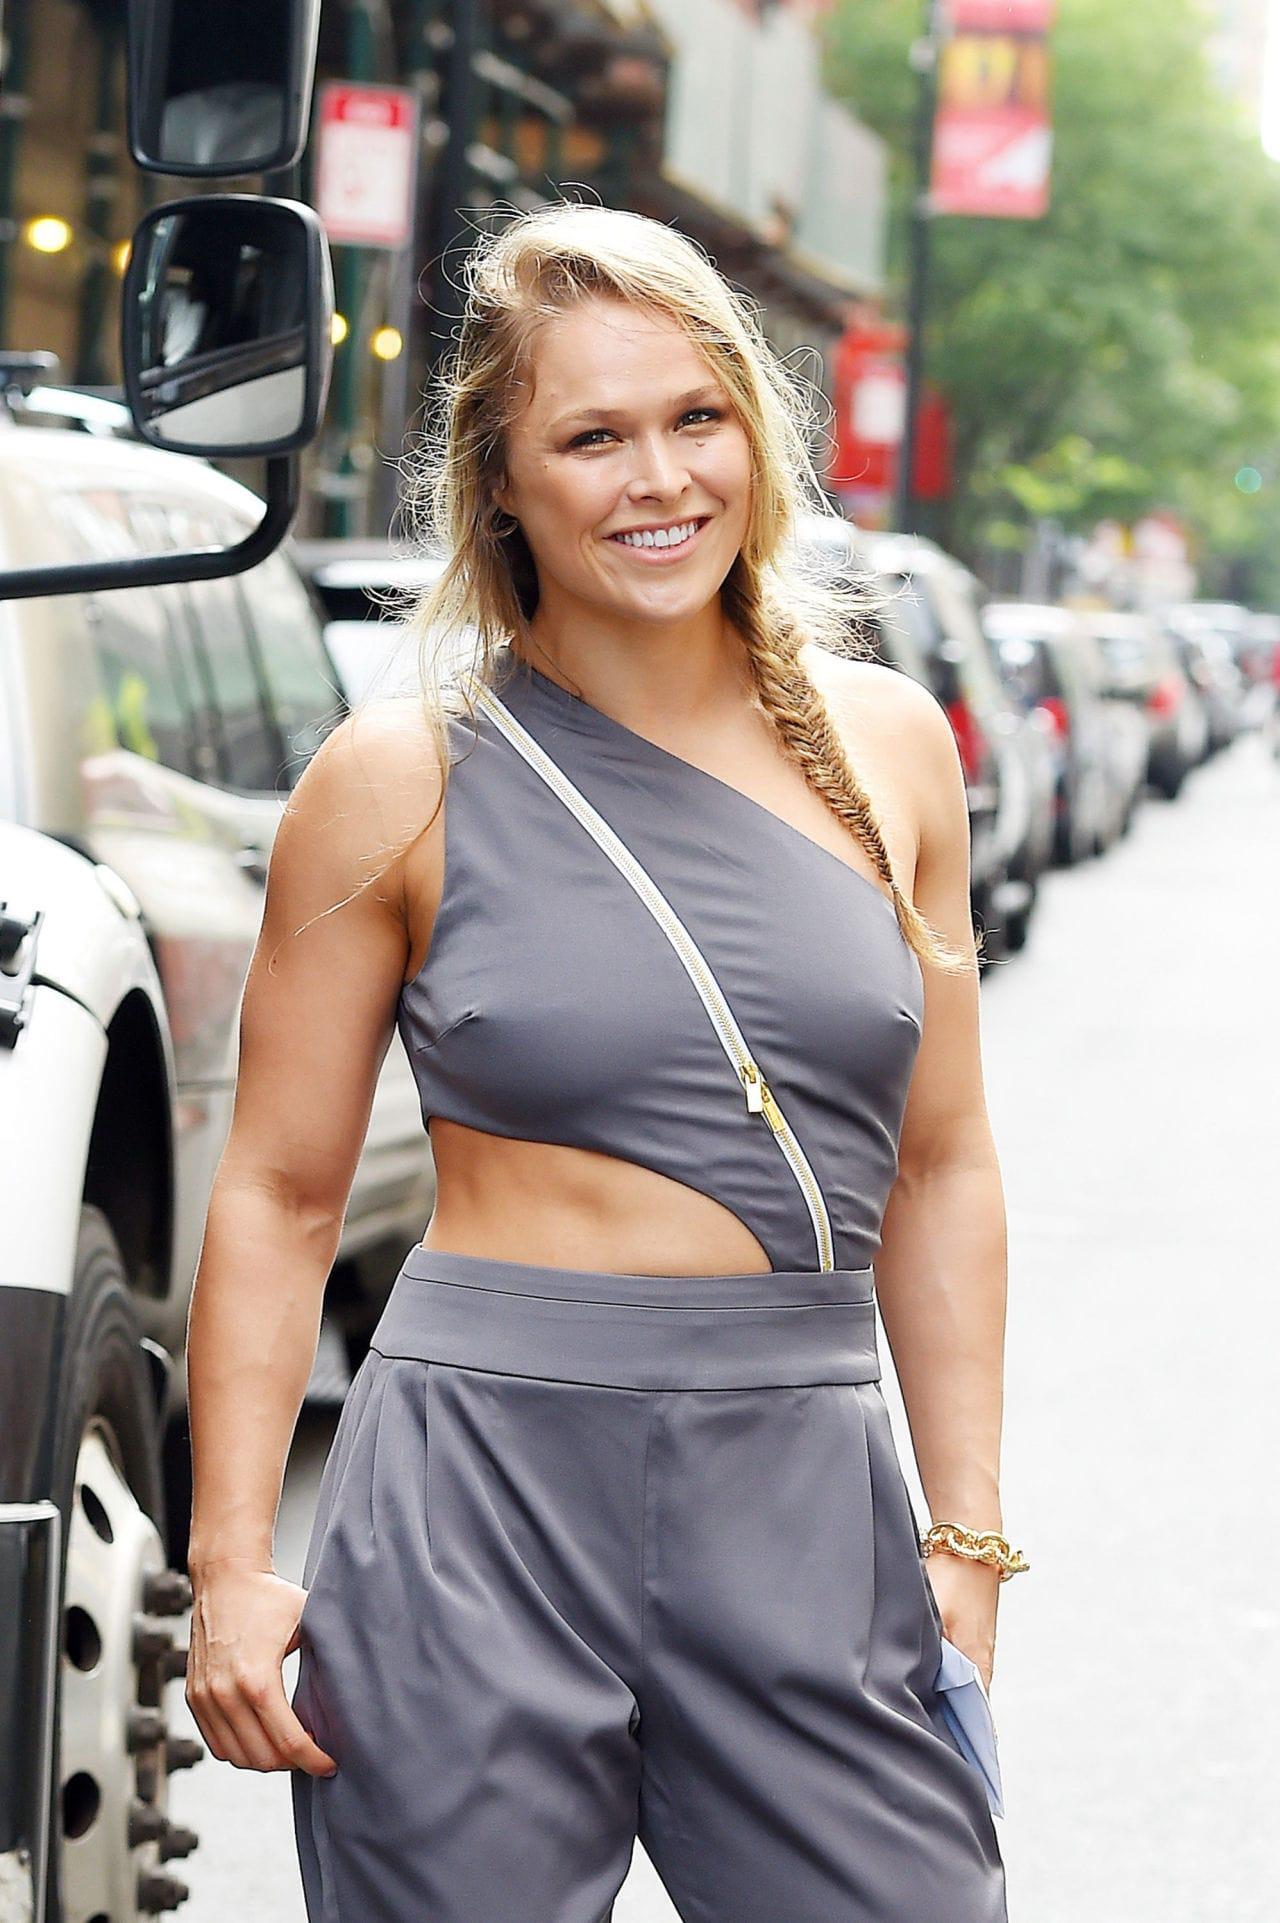 Ronda Rousey Background